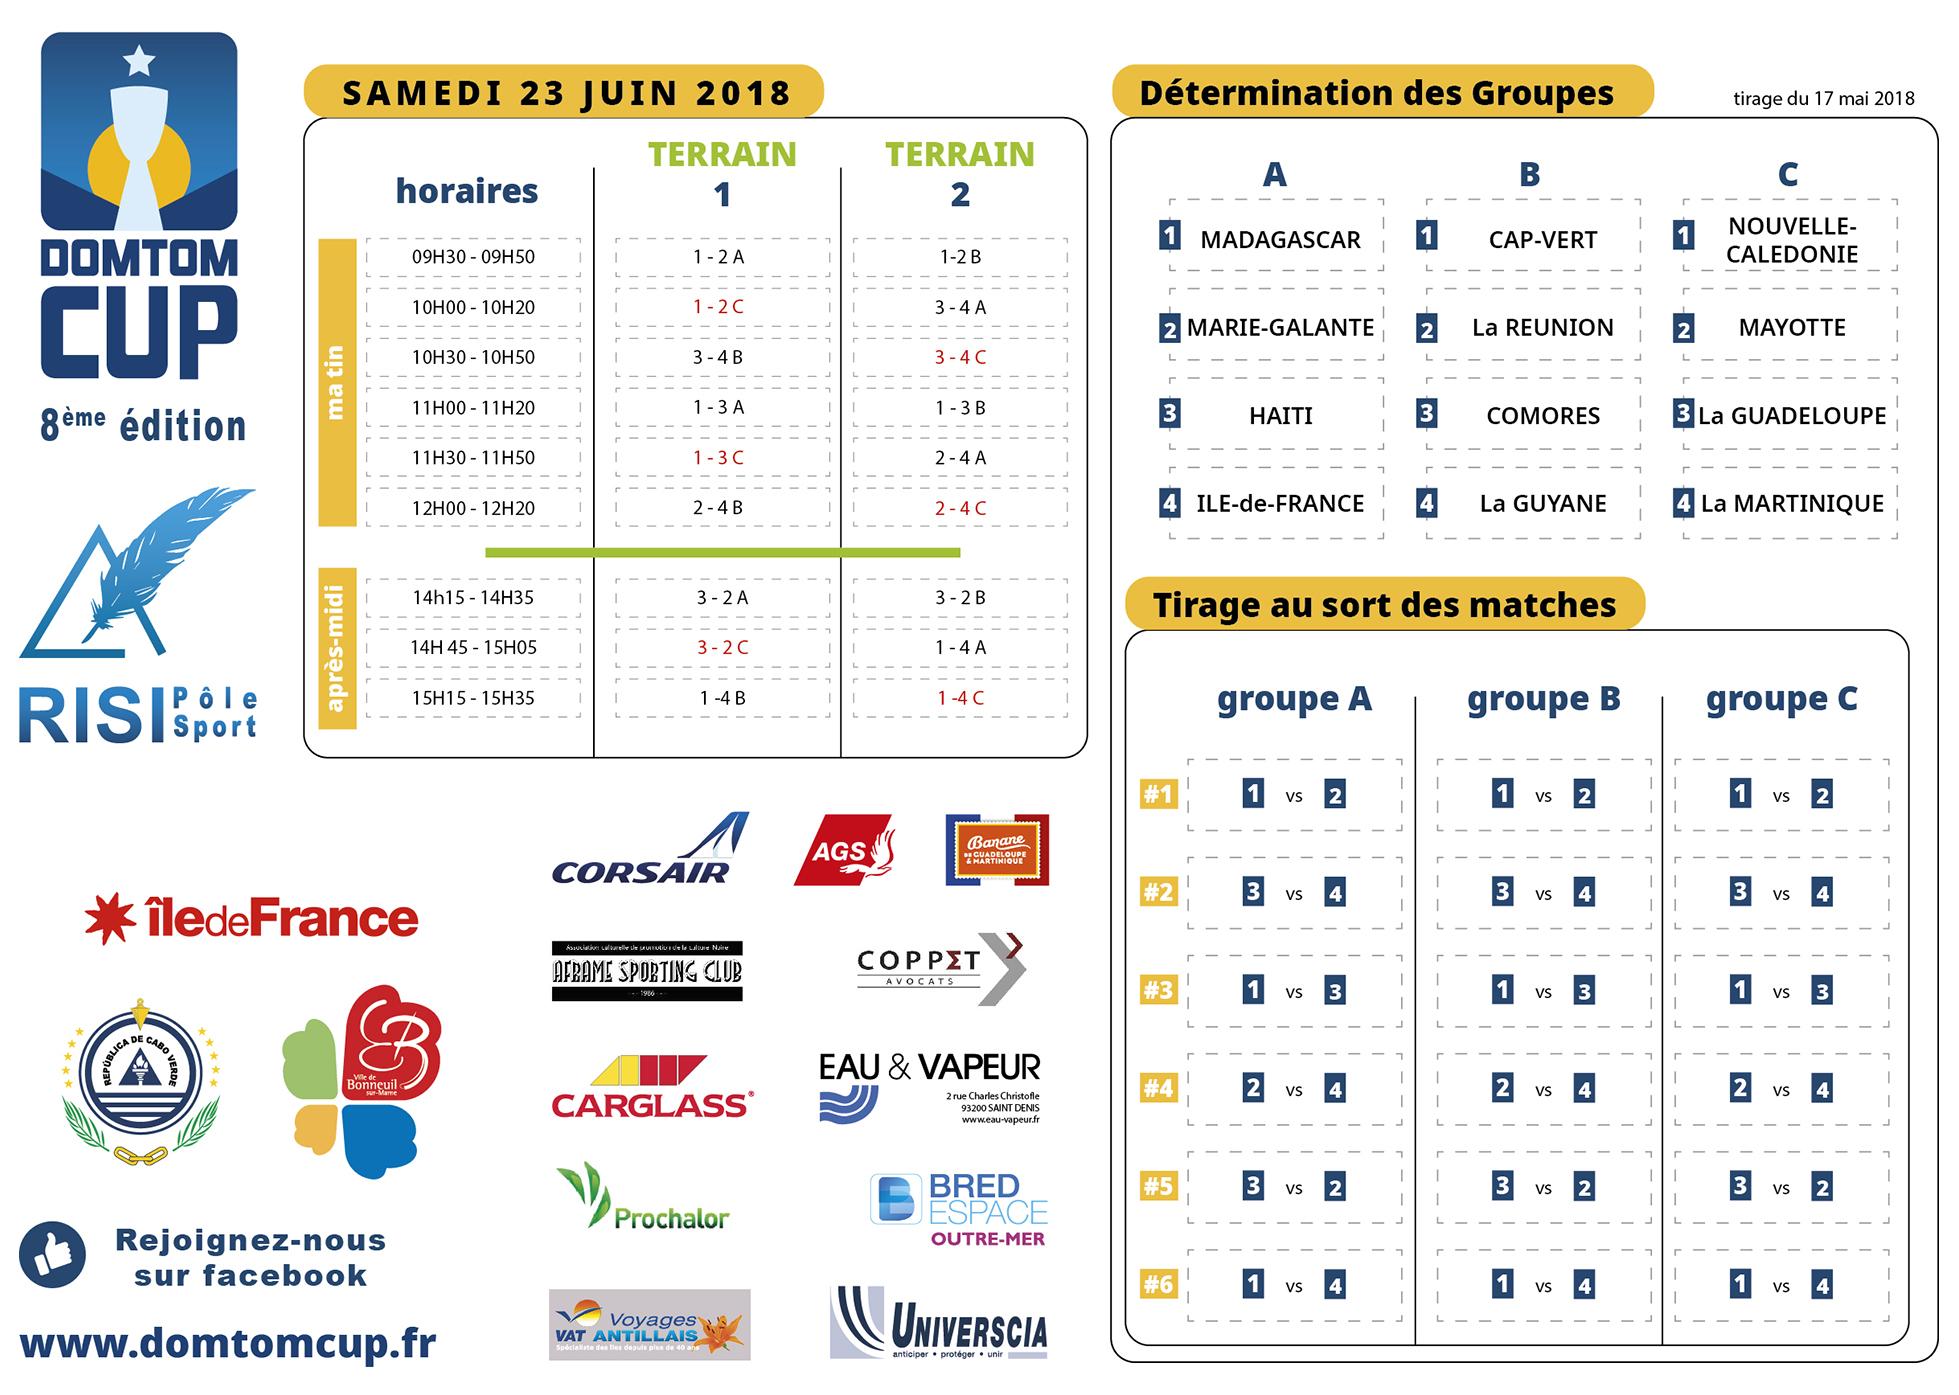 DOM TOM CUP - samedi 23 juin 2018